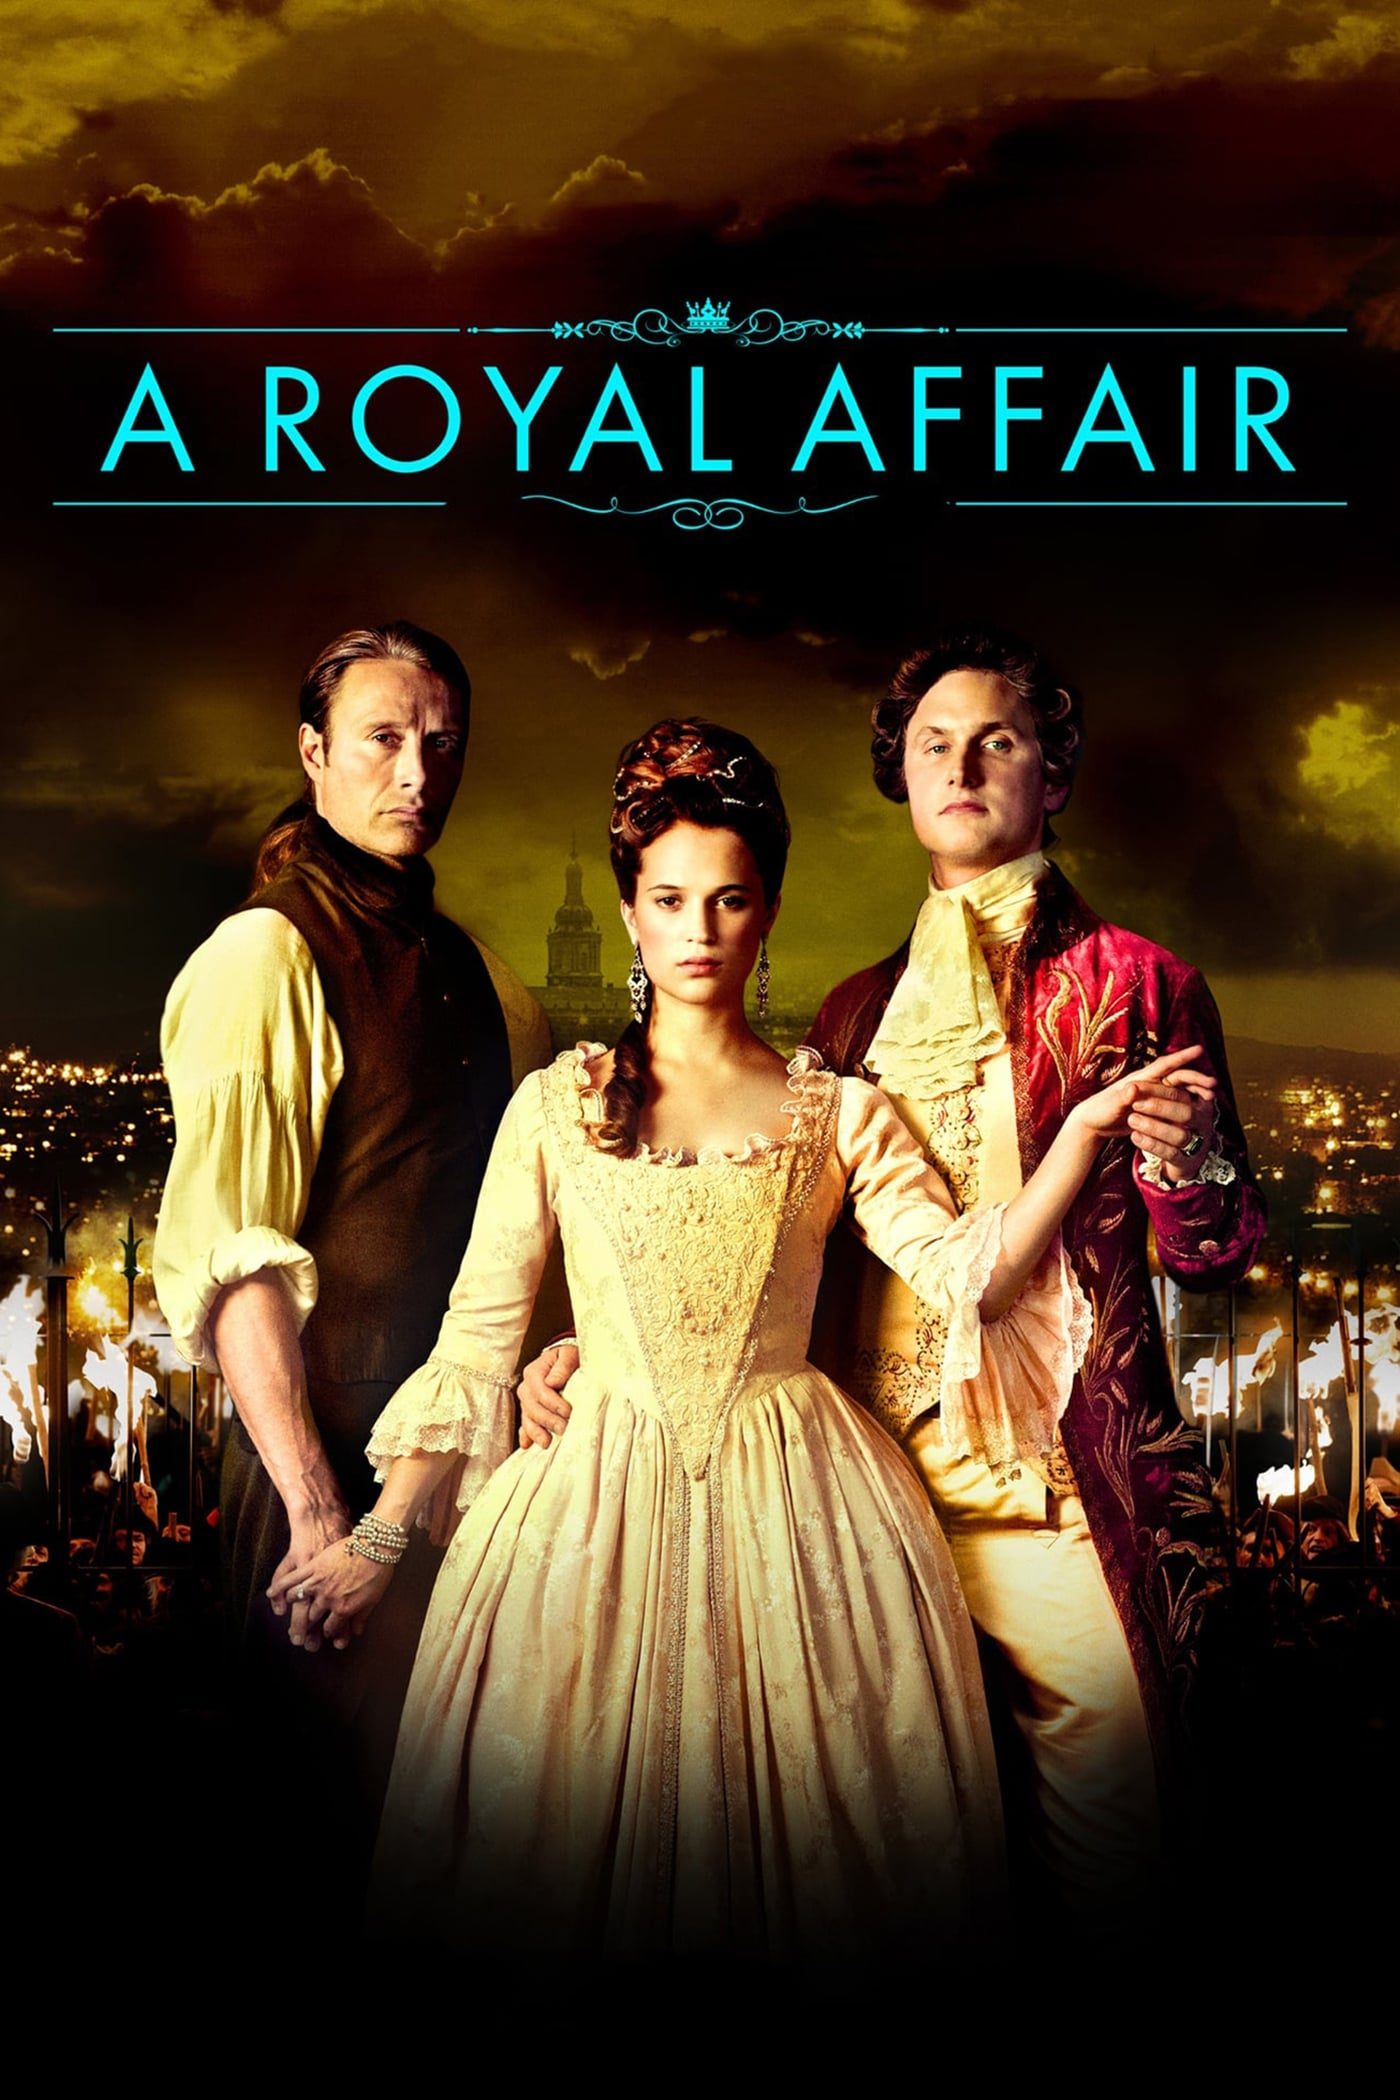 La reina infiel (A Royal Affair)